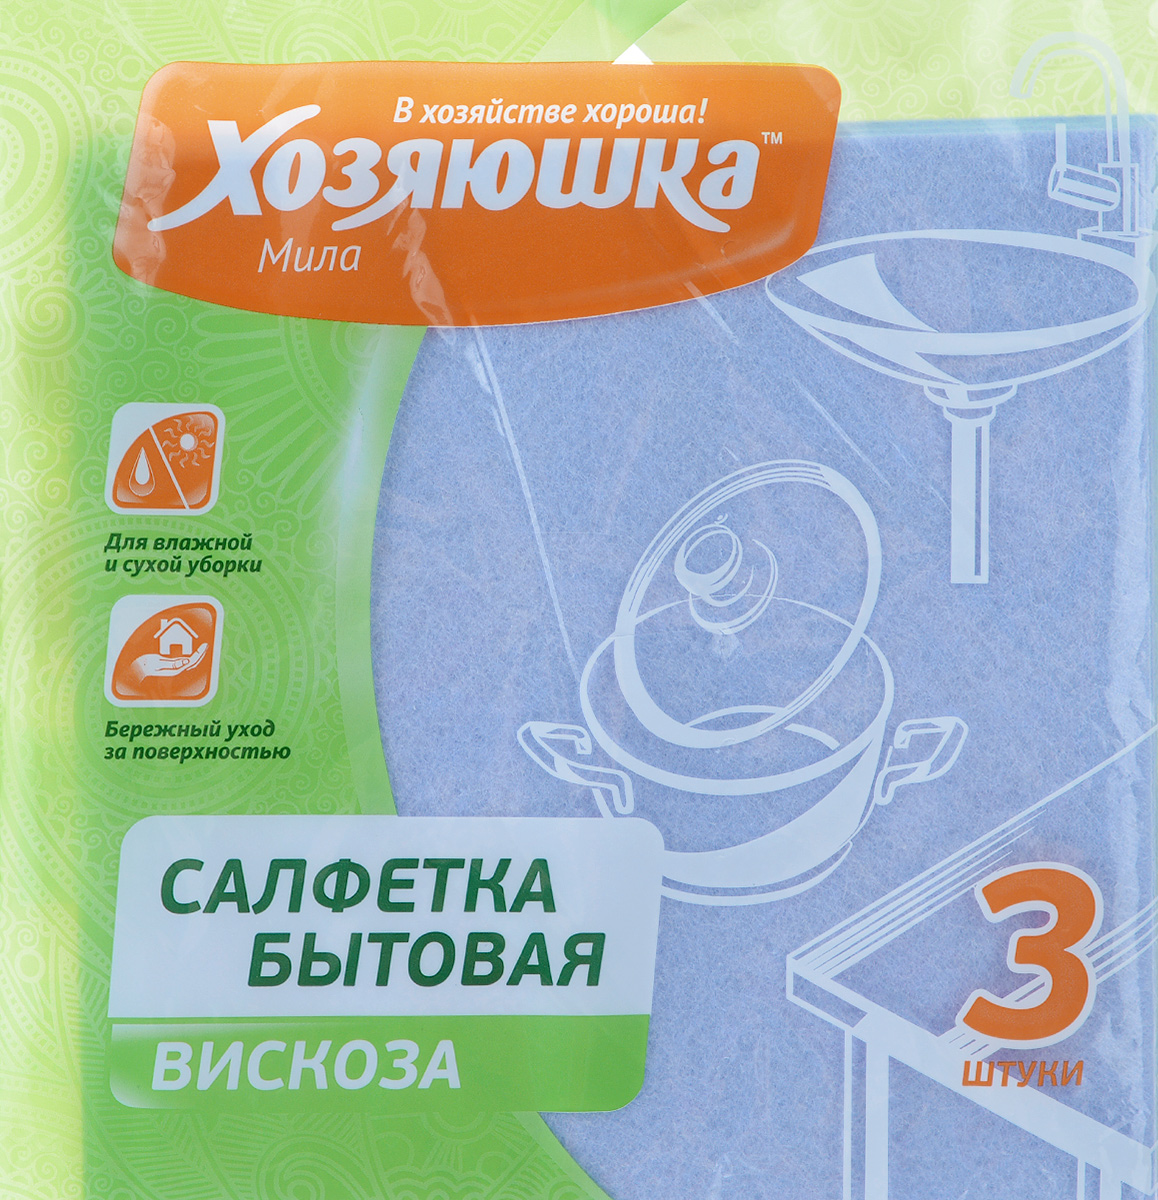 Салфетка бытовая Хозяюшка Мила, 35 см х 35 см, цвет в ассортименте, 3 шт. 04001 салфетка замшевая azard glassclean 34 х 34 см